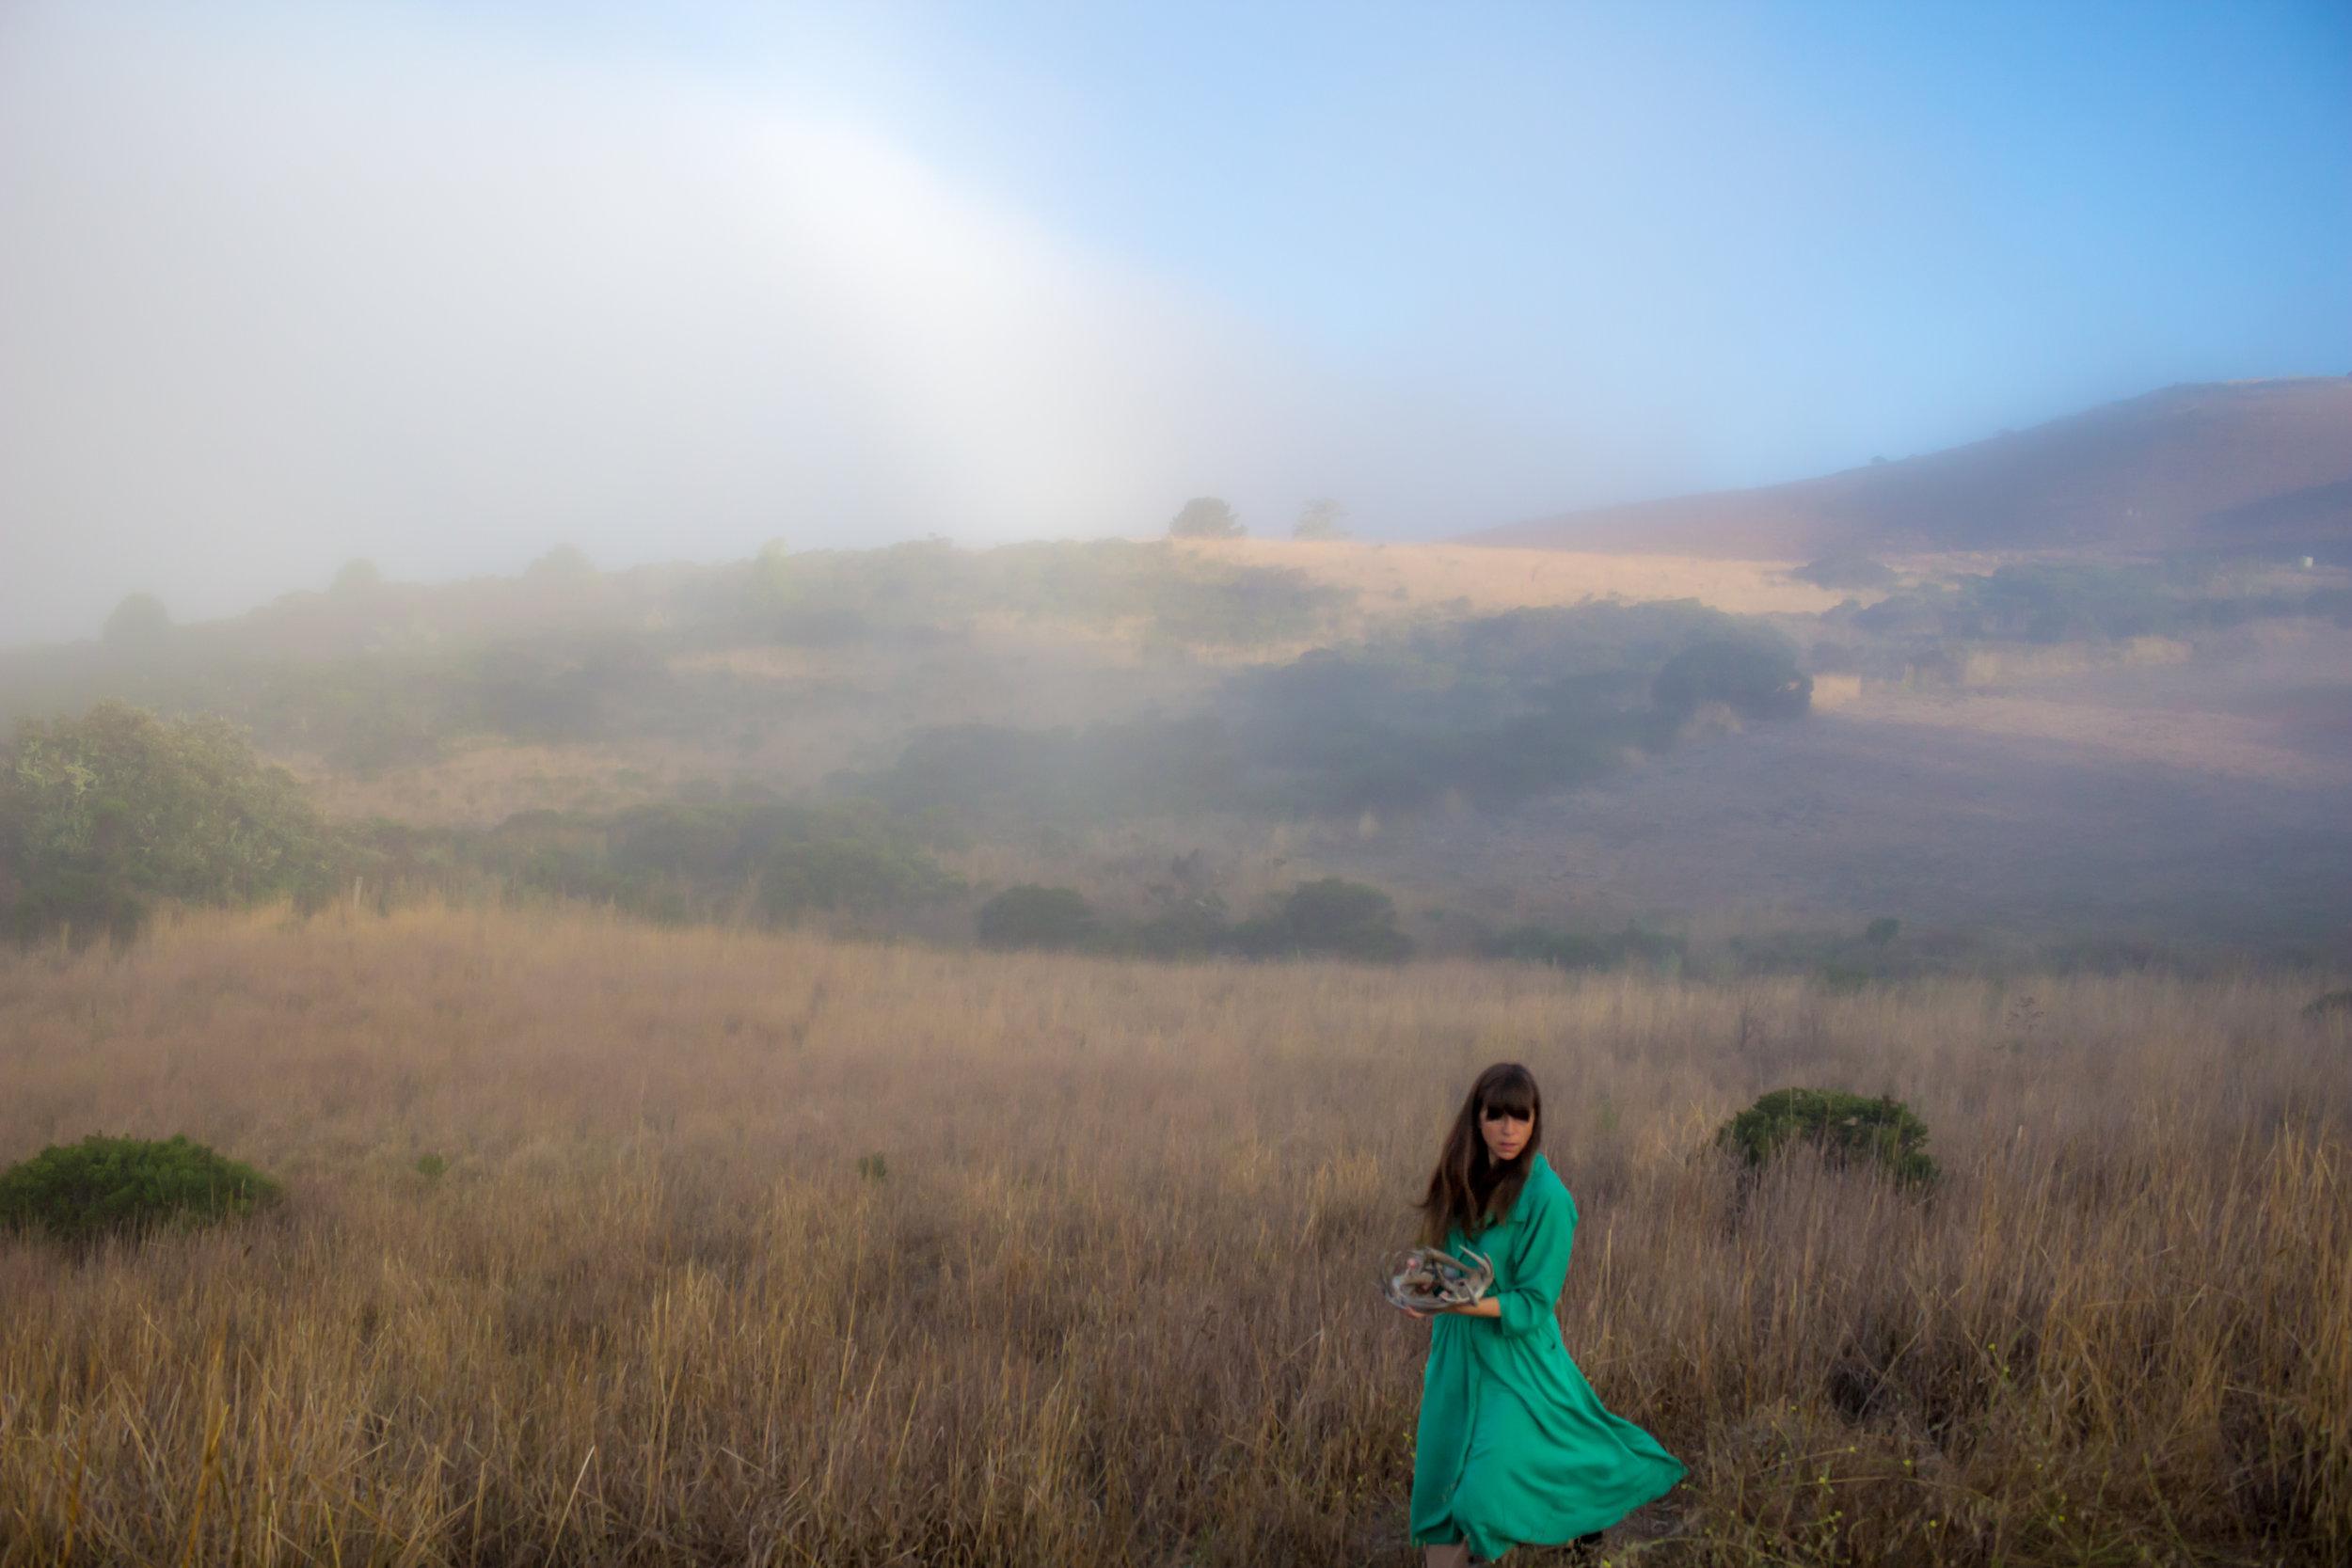 ANTLERED EARTH |Maré Hieronimus ~ Woodside, California